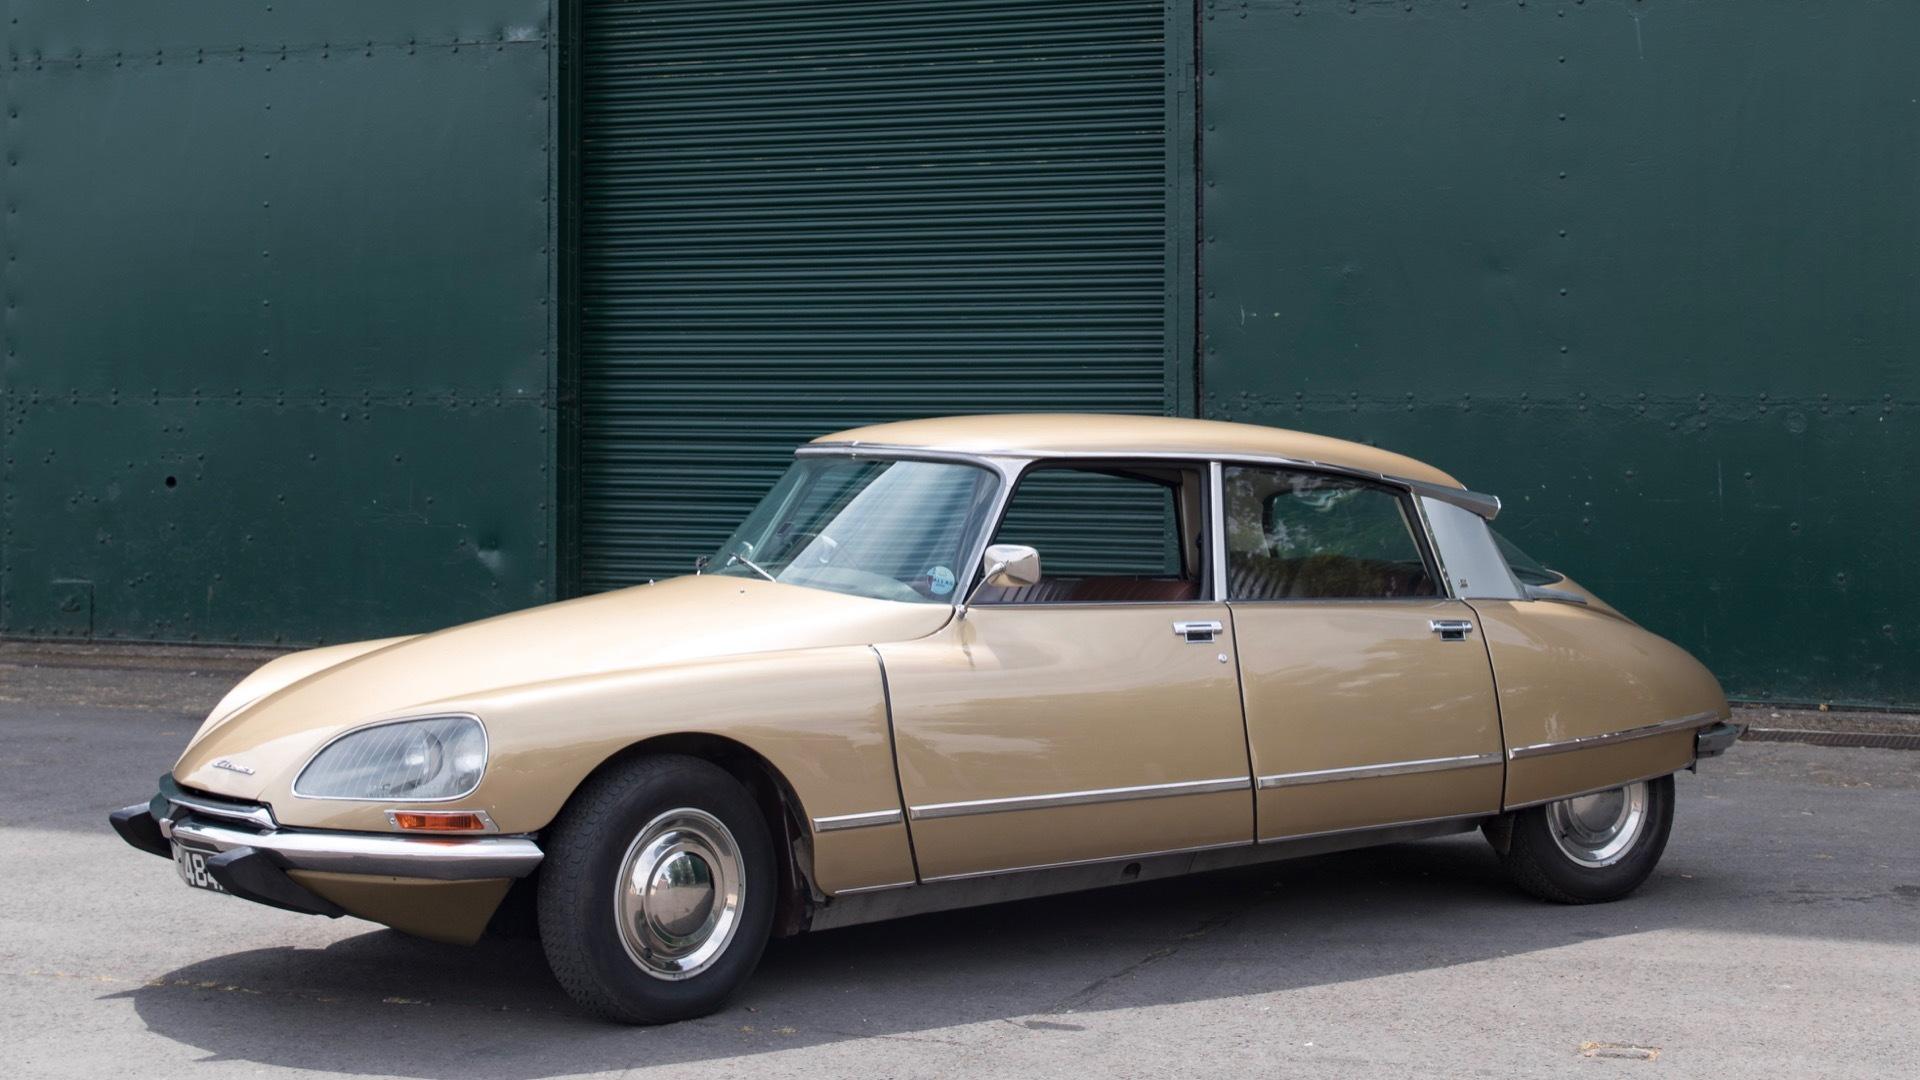 Electrogenic 1971 Citroën DS EV conversion